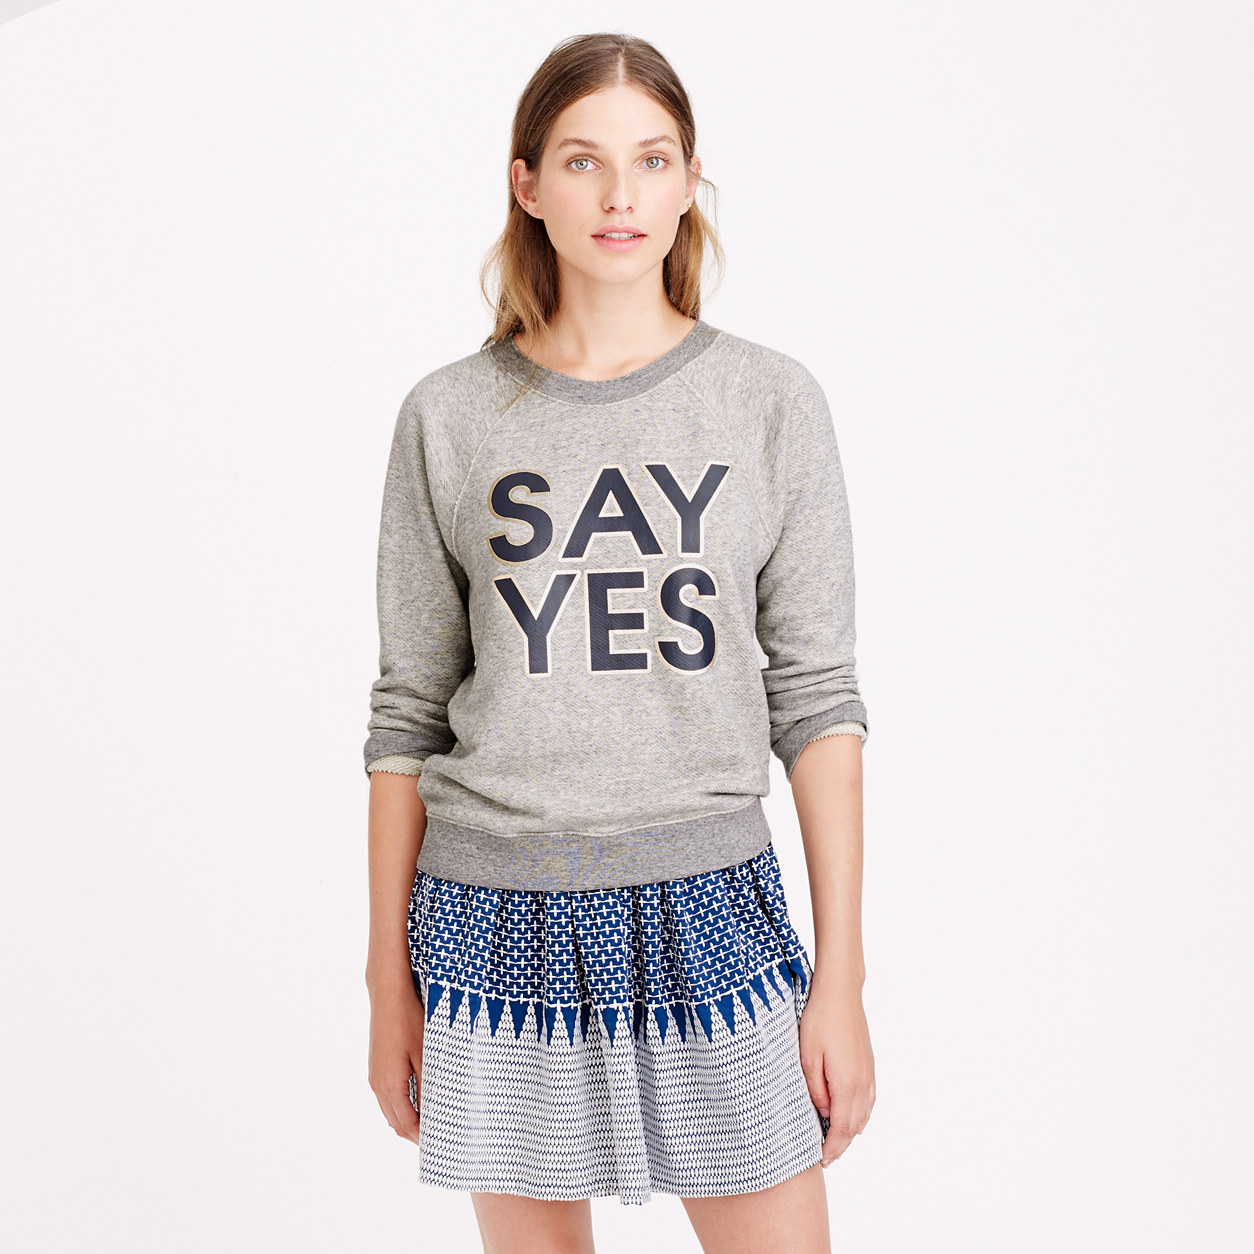 J.Crew Graphic Sweatshirt